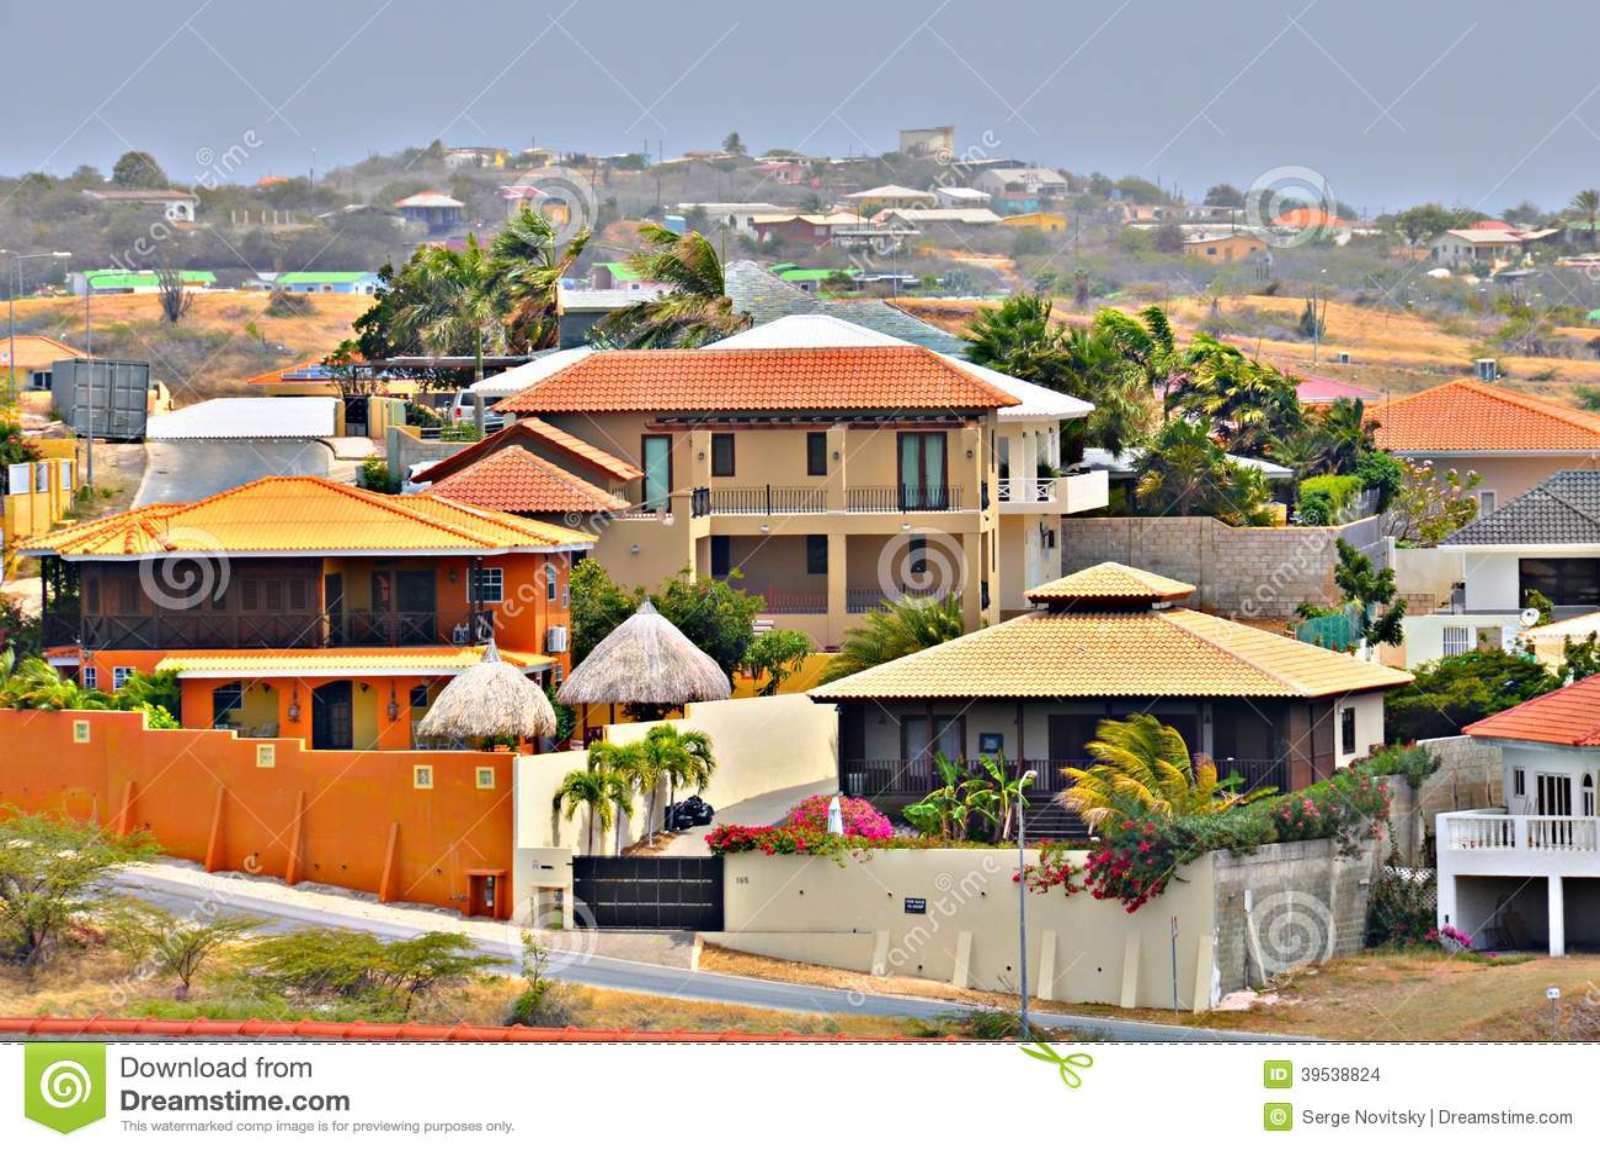 Chambres dans Willemstad, Curaçao